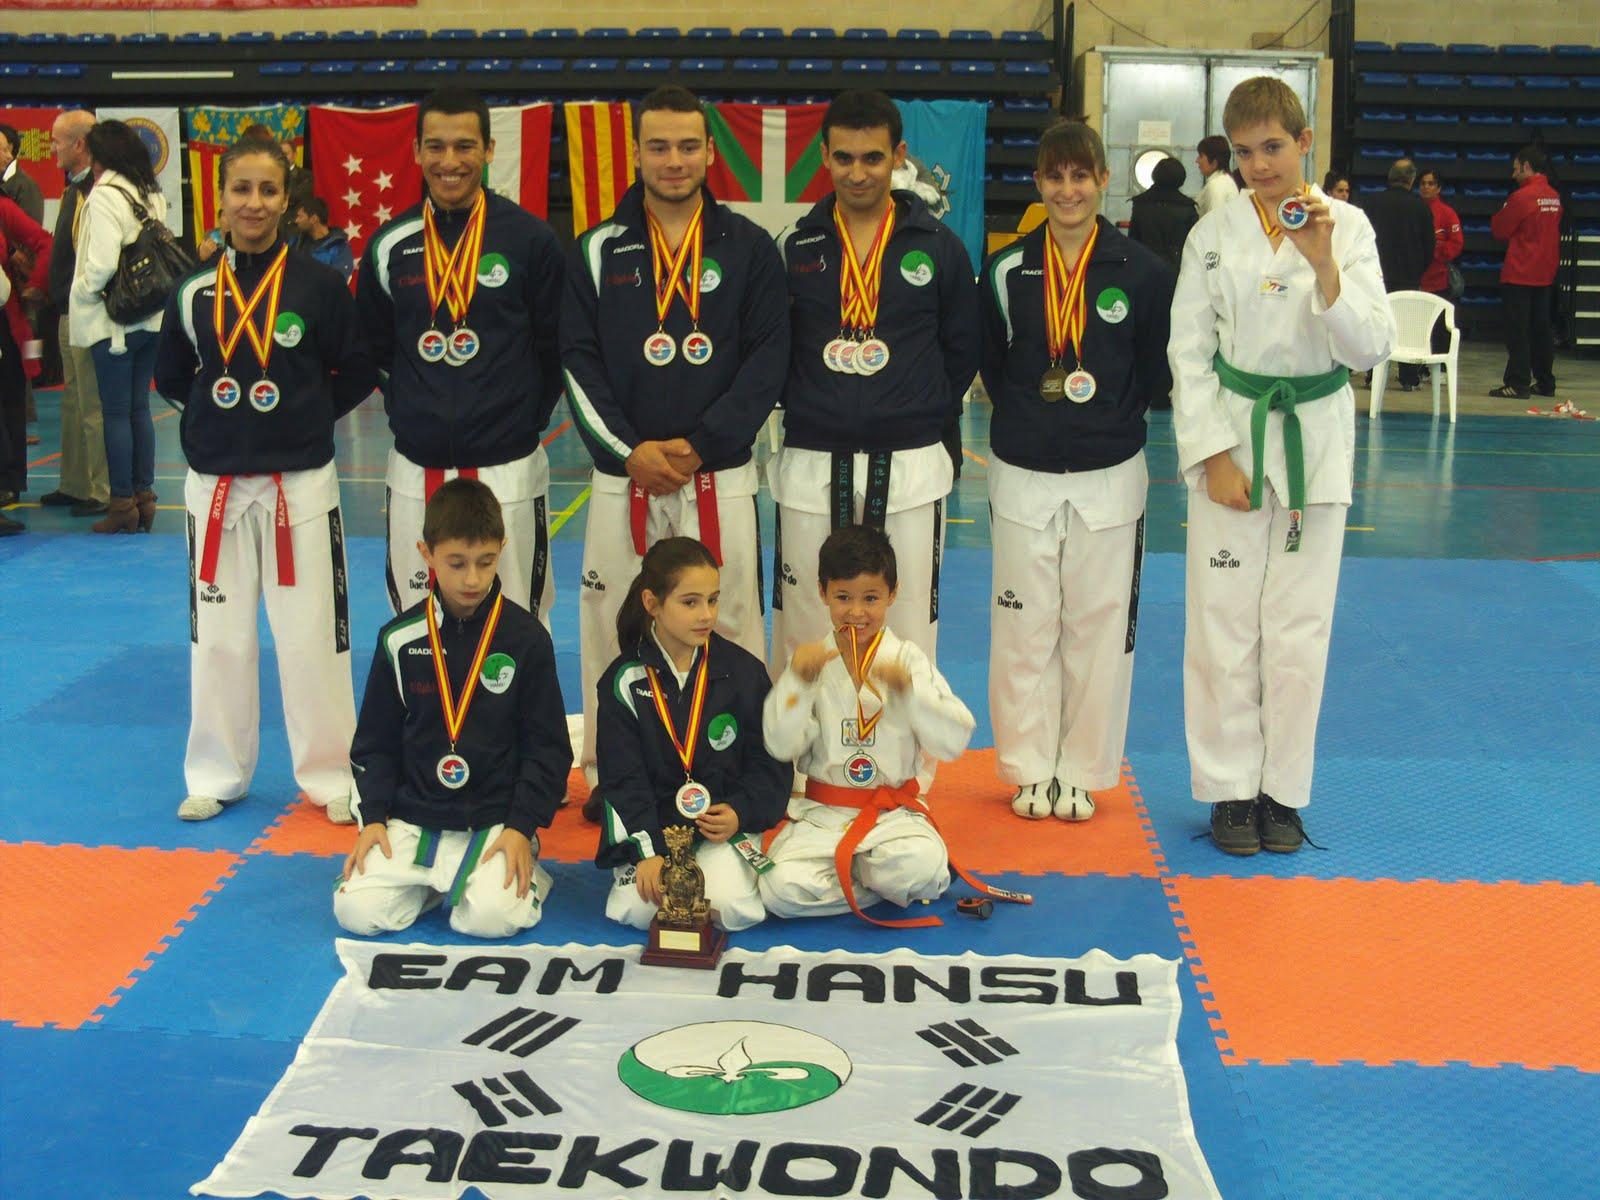 Escuela de taekwondo hansu 2010 for Gimnasio yuncos